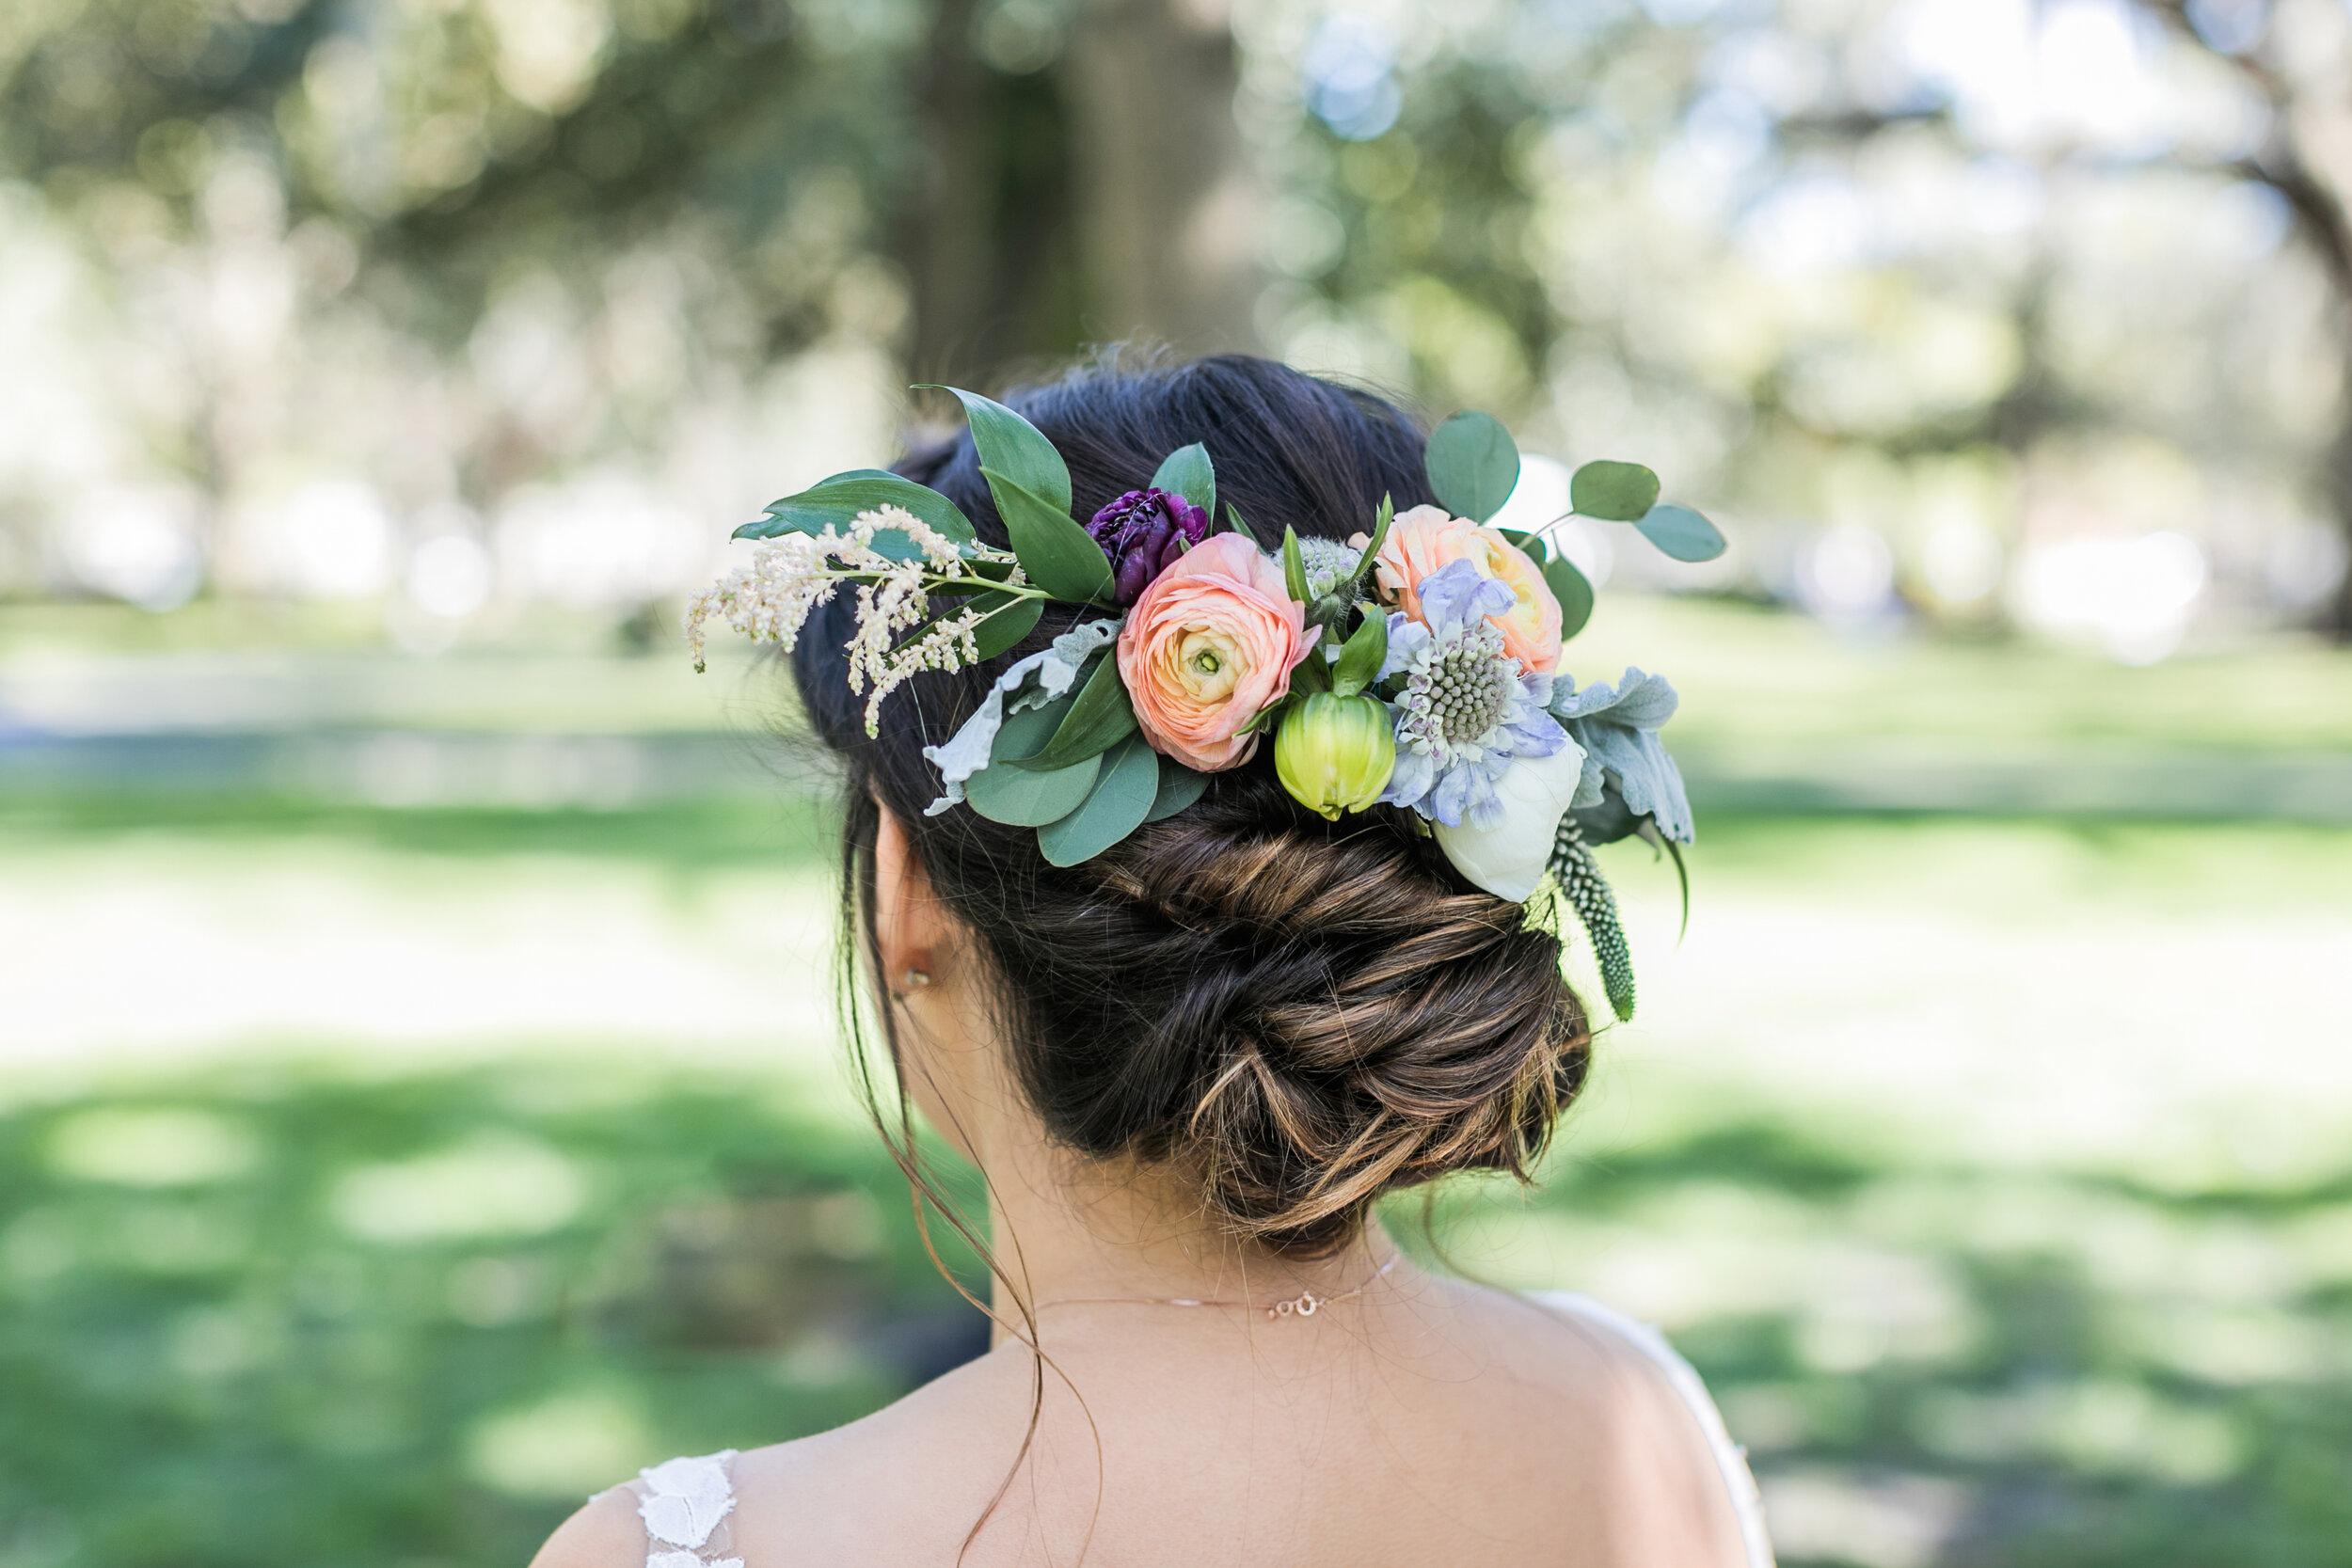 ivory-and-beau-blog-weddings-ivory-and-beau-couple-dominique-and-andres-savannah-florist-wedding-planning-savannah-bridal-boutique-wedding-flowers-KIP_WEBERWEDDING_RAILROADMUSEUM-605.JPG